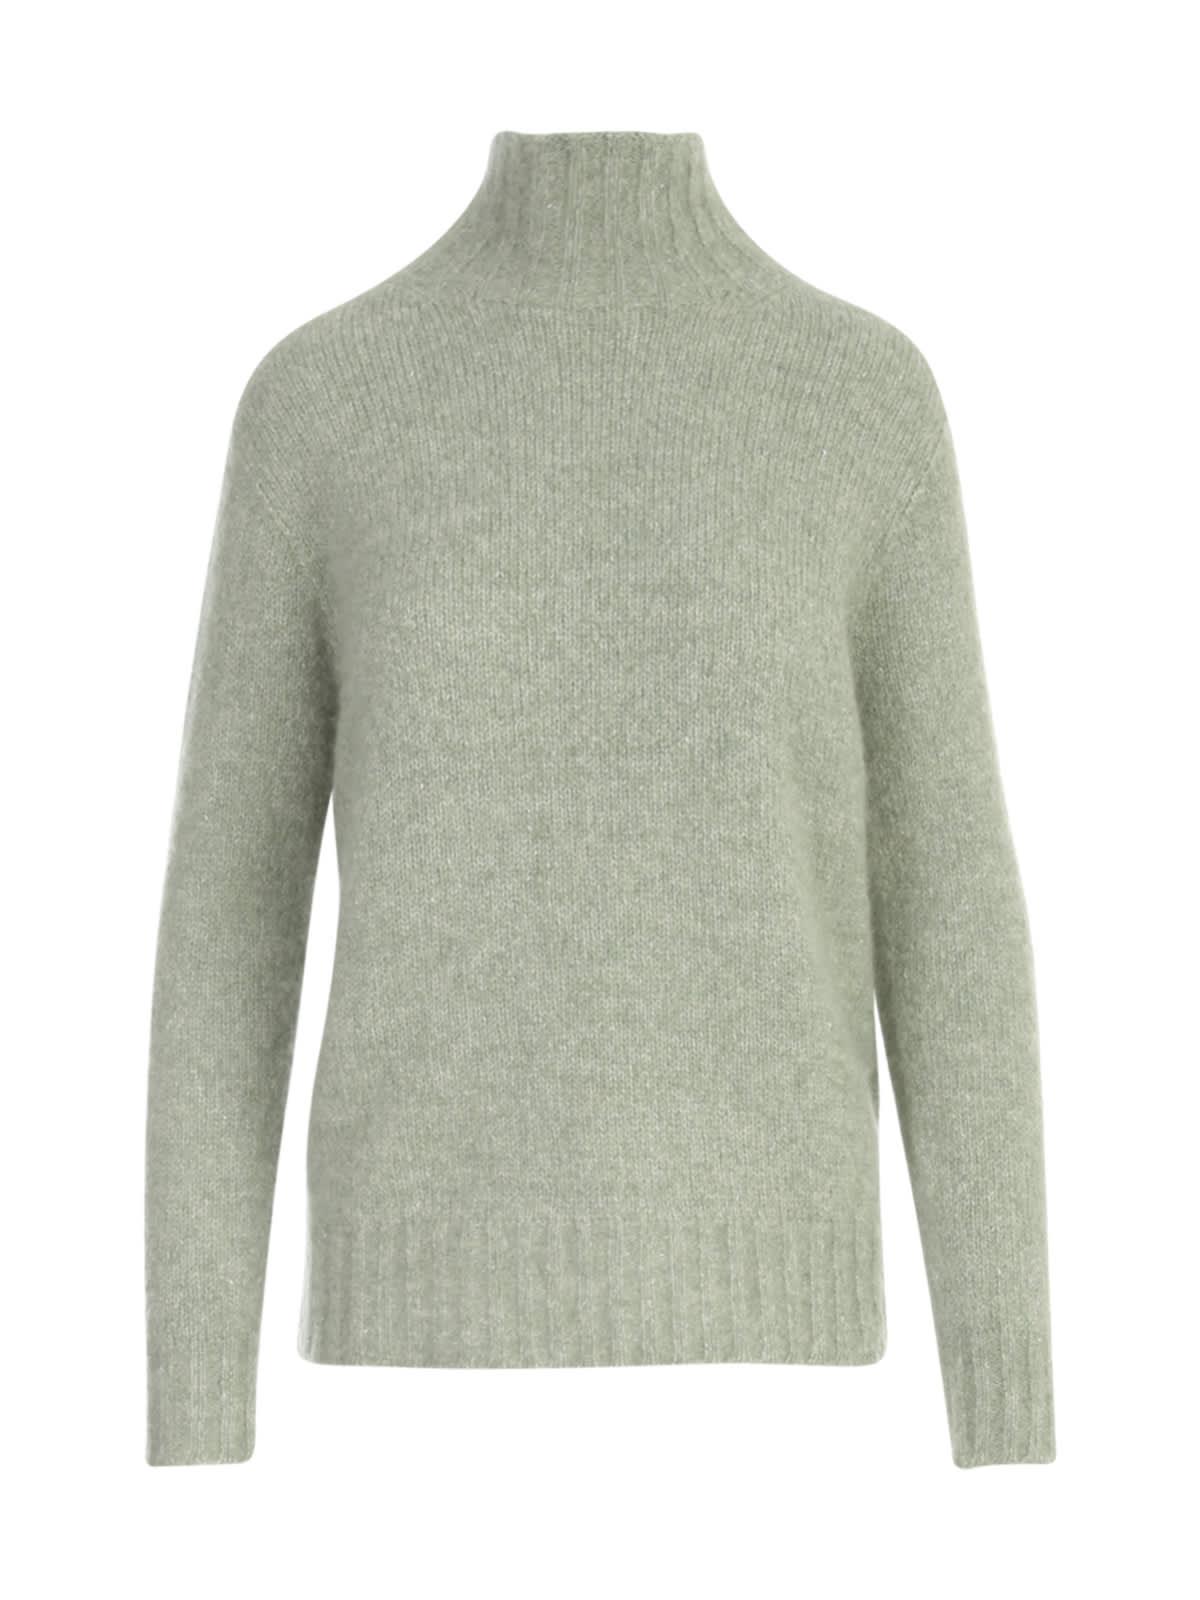 Turtle Neck L/s Sweater